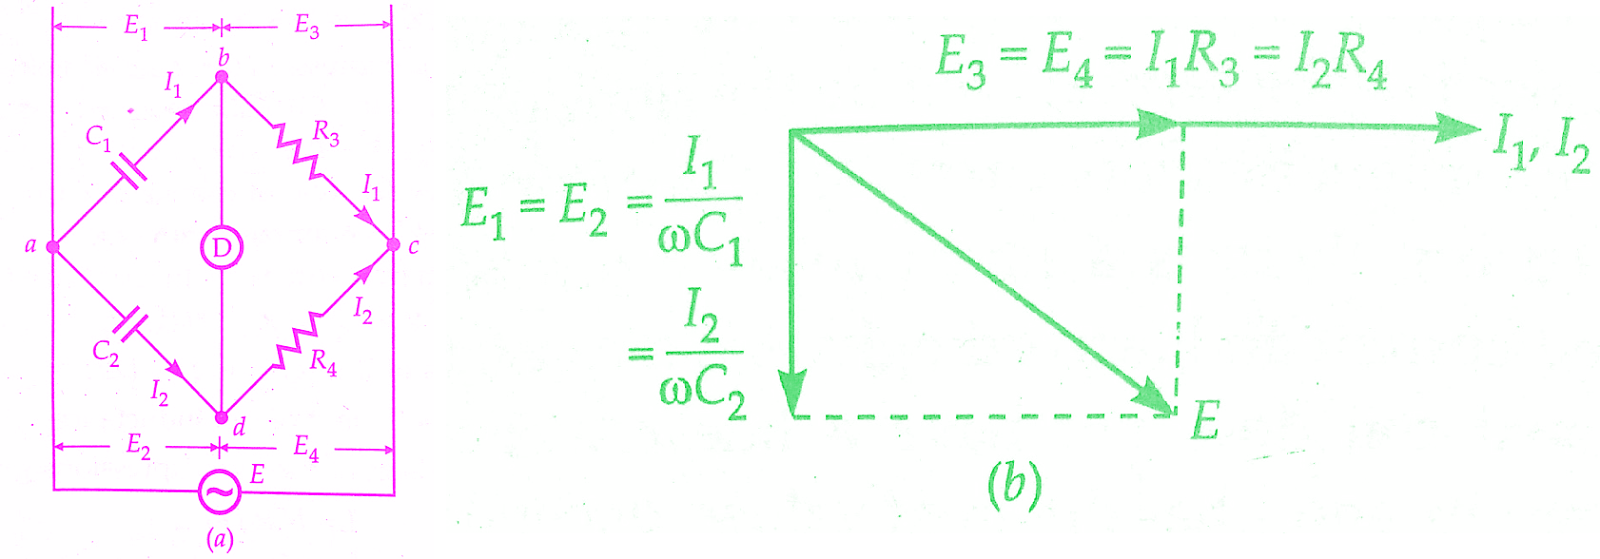 How To Make A Phasor Diagram Network Software Open Source Measurement Of Capacitance By De Sauty's Bridge